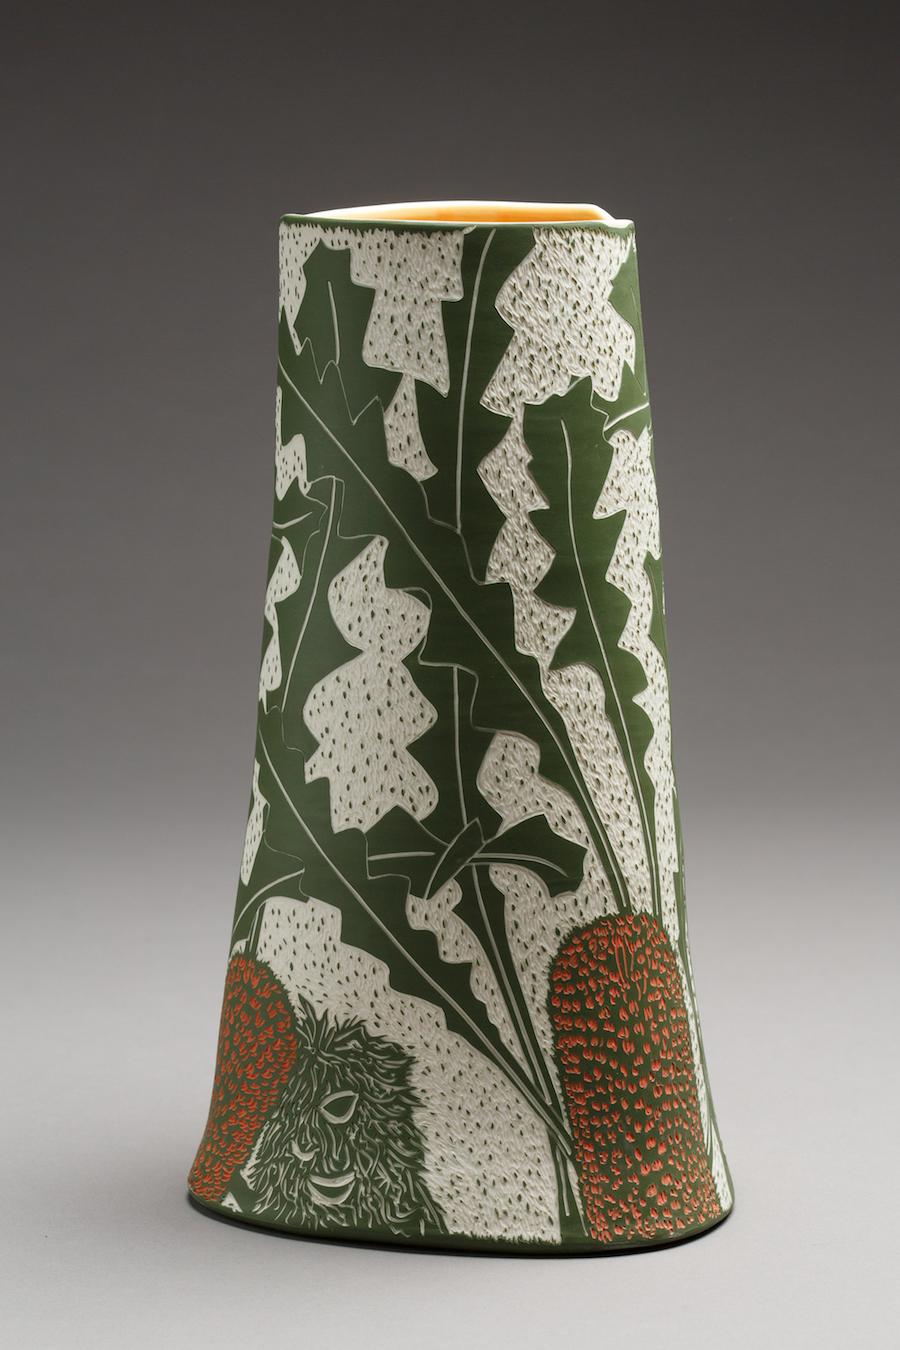 Banksia gardneri, 2018. Porcelain, sgraffito, 38.6h x 21.8w x 20.3d cm. Image: Art Atelier